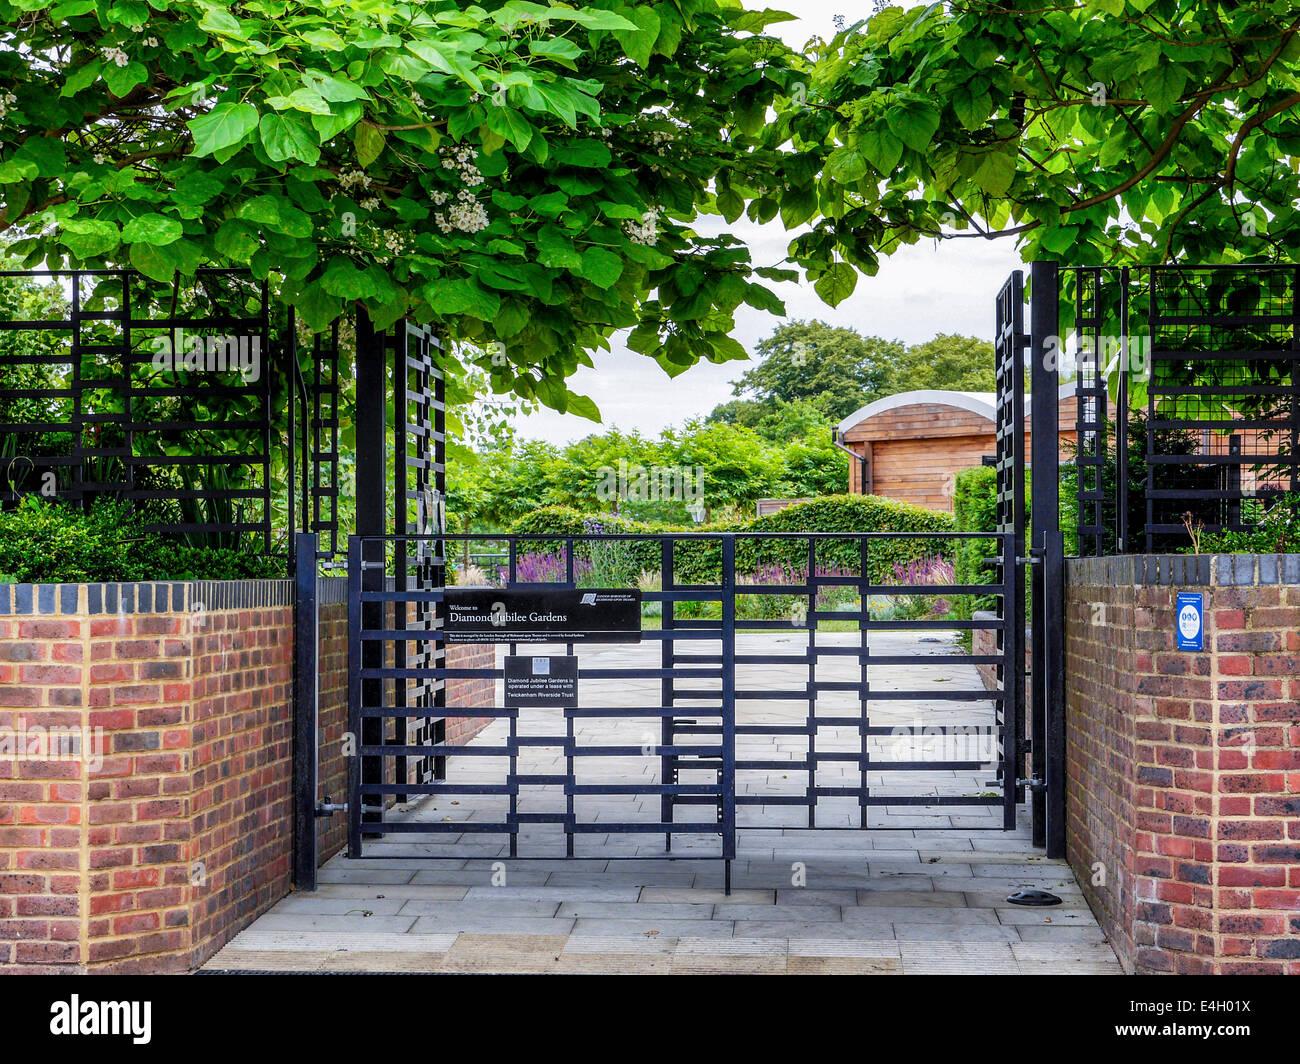 Diamond Jubilee Gardens, Twickenham, Greater London, UK - Old Riverside swimming pool site redeveloped - Stock Image